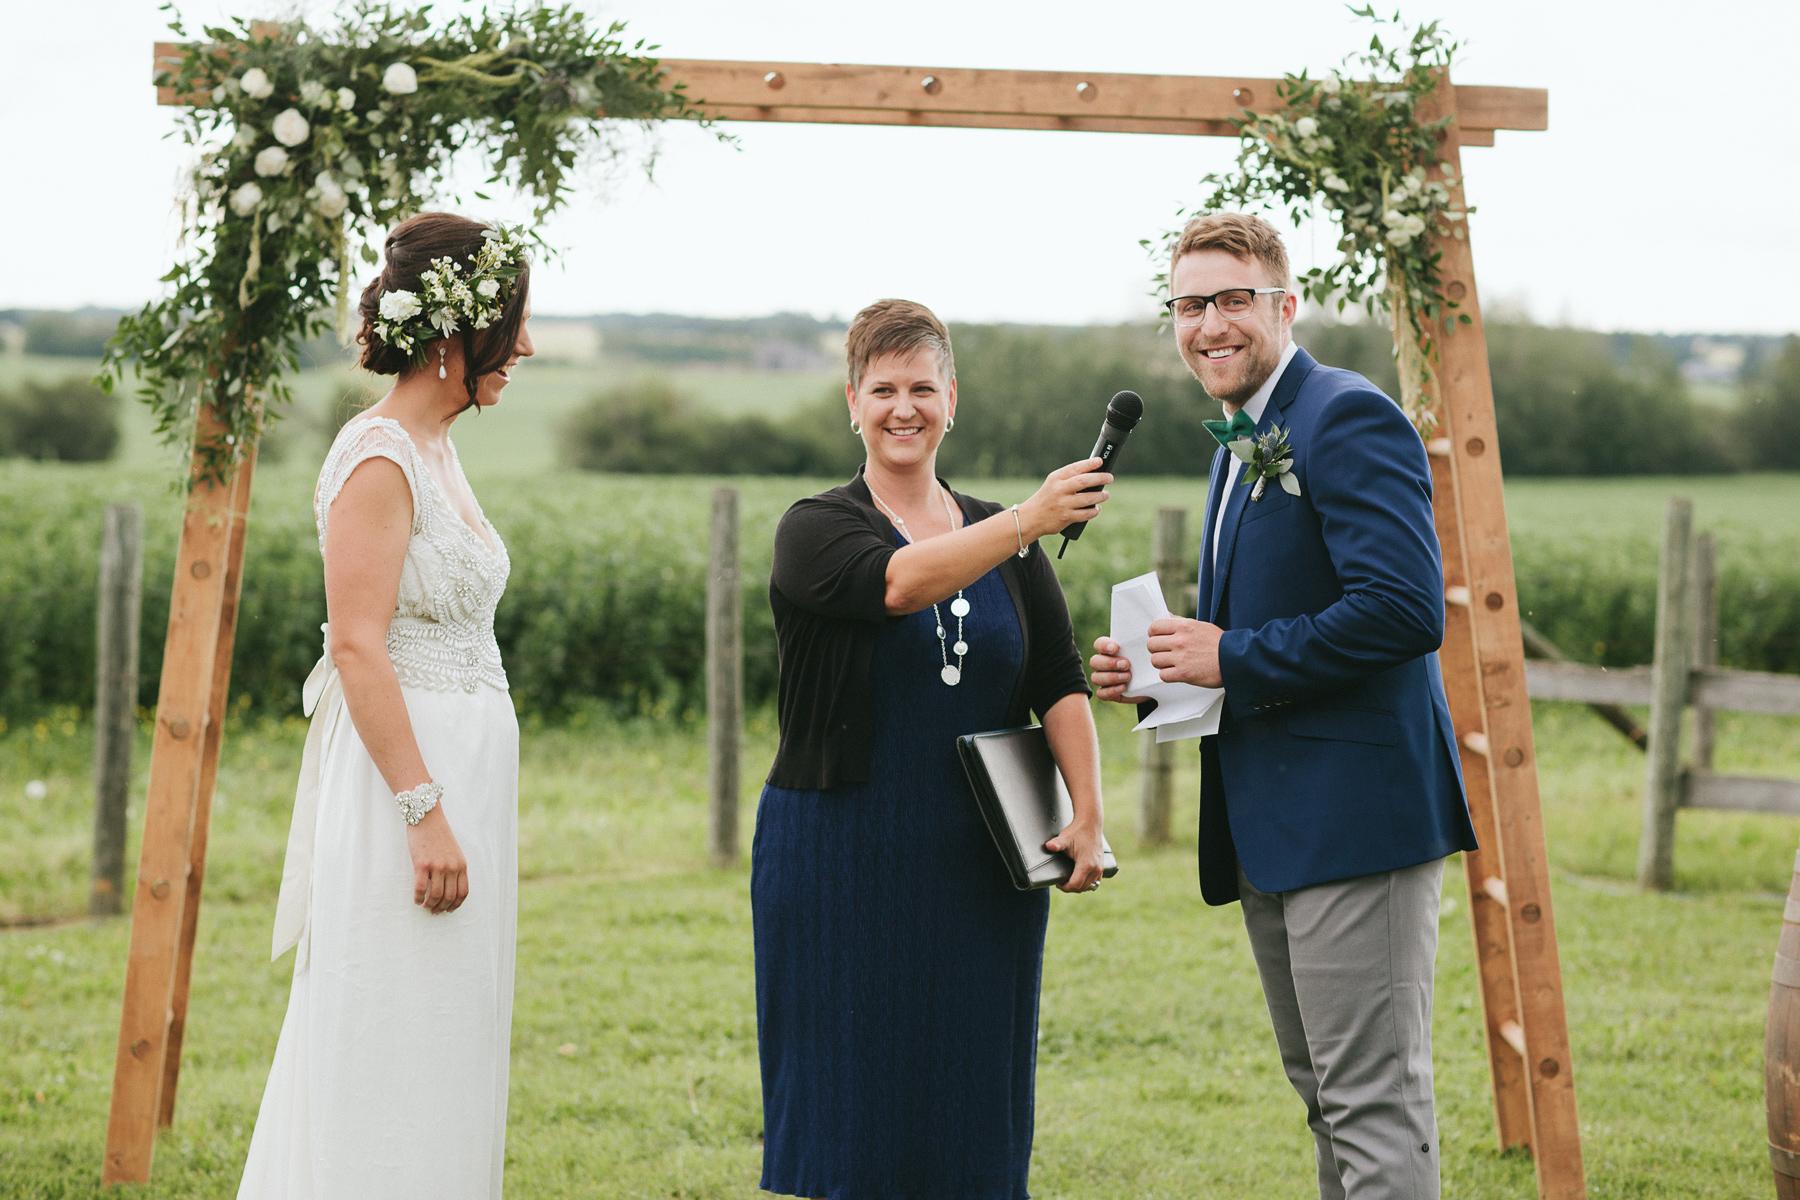 alberta-farm-wedding-photographer-rp-wj-115.jpg